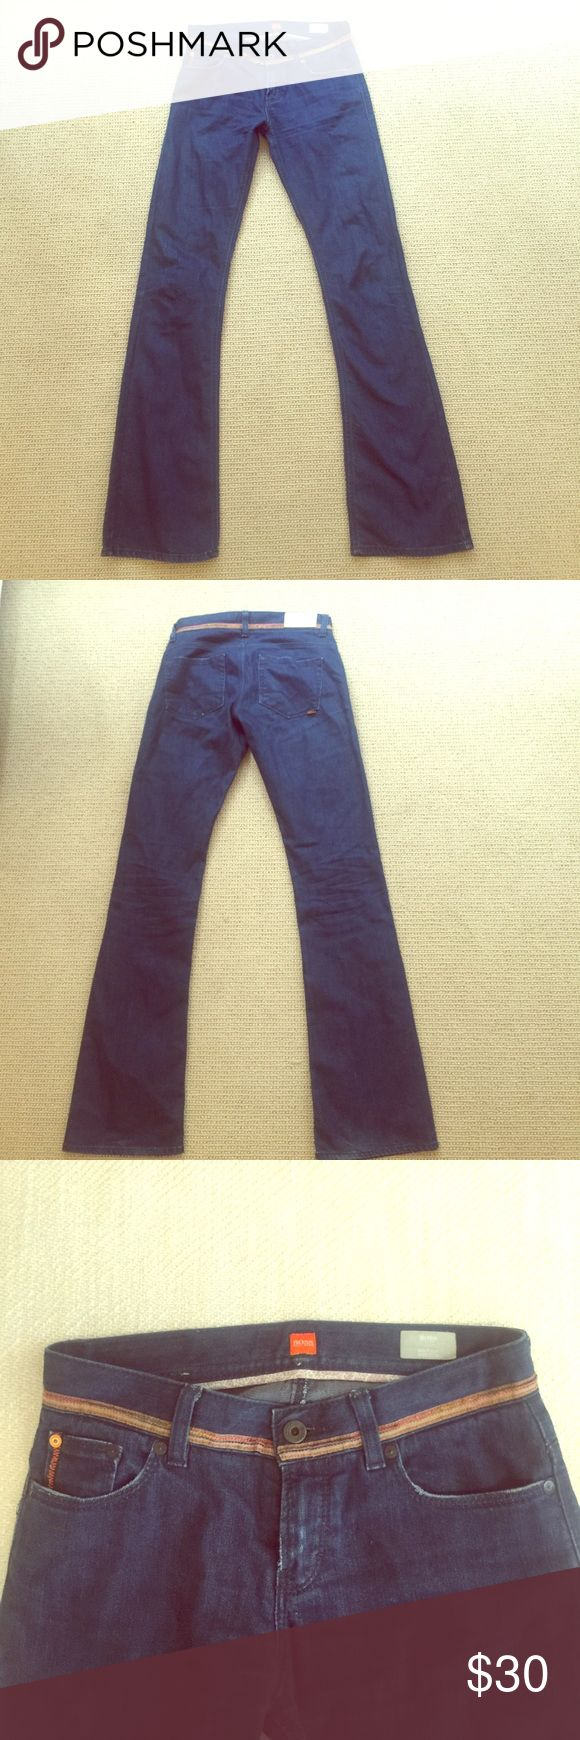 Selling this Hugo Boss Boot Cut Jeans Size 27 on Poshmark! My username is: mohnyc. #shopmycloset #poshmark #fashion #shopping #style #forsale #Hugo Boss #Denim